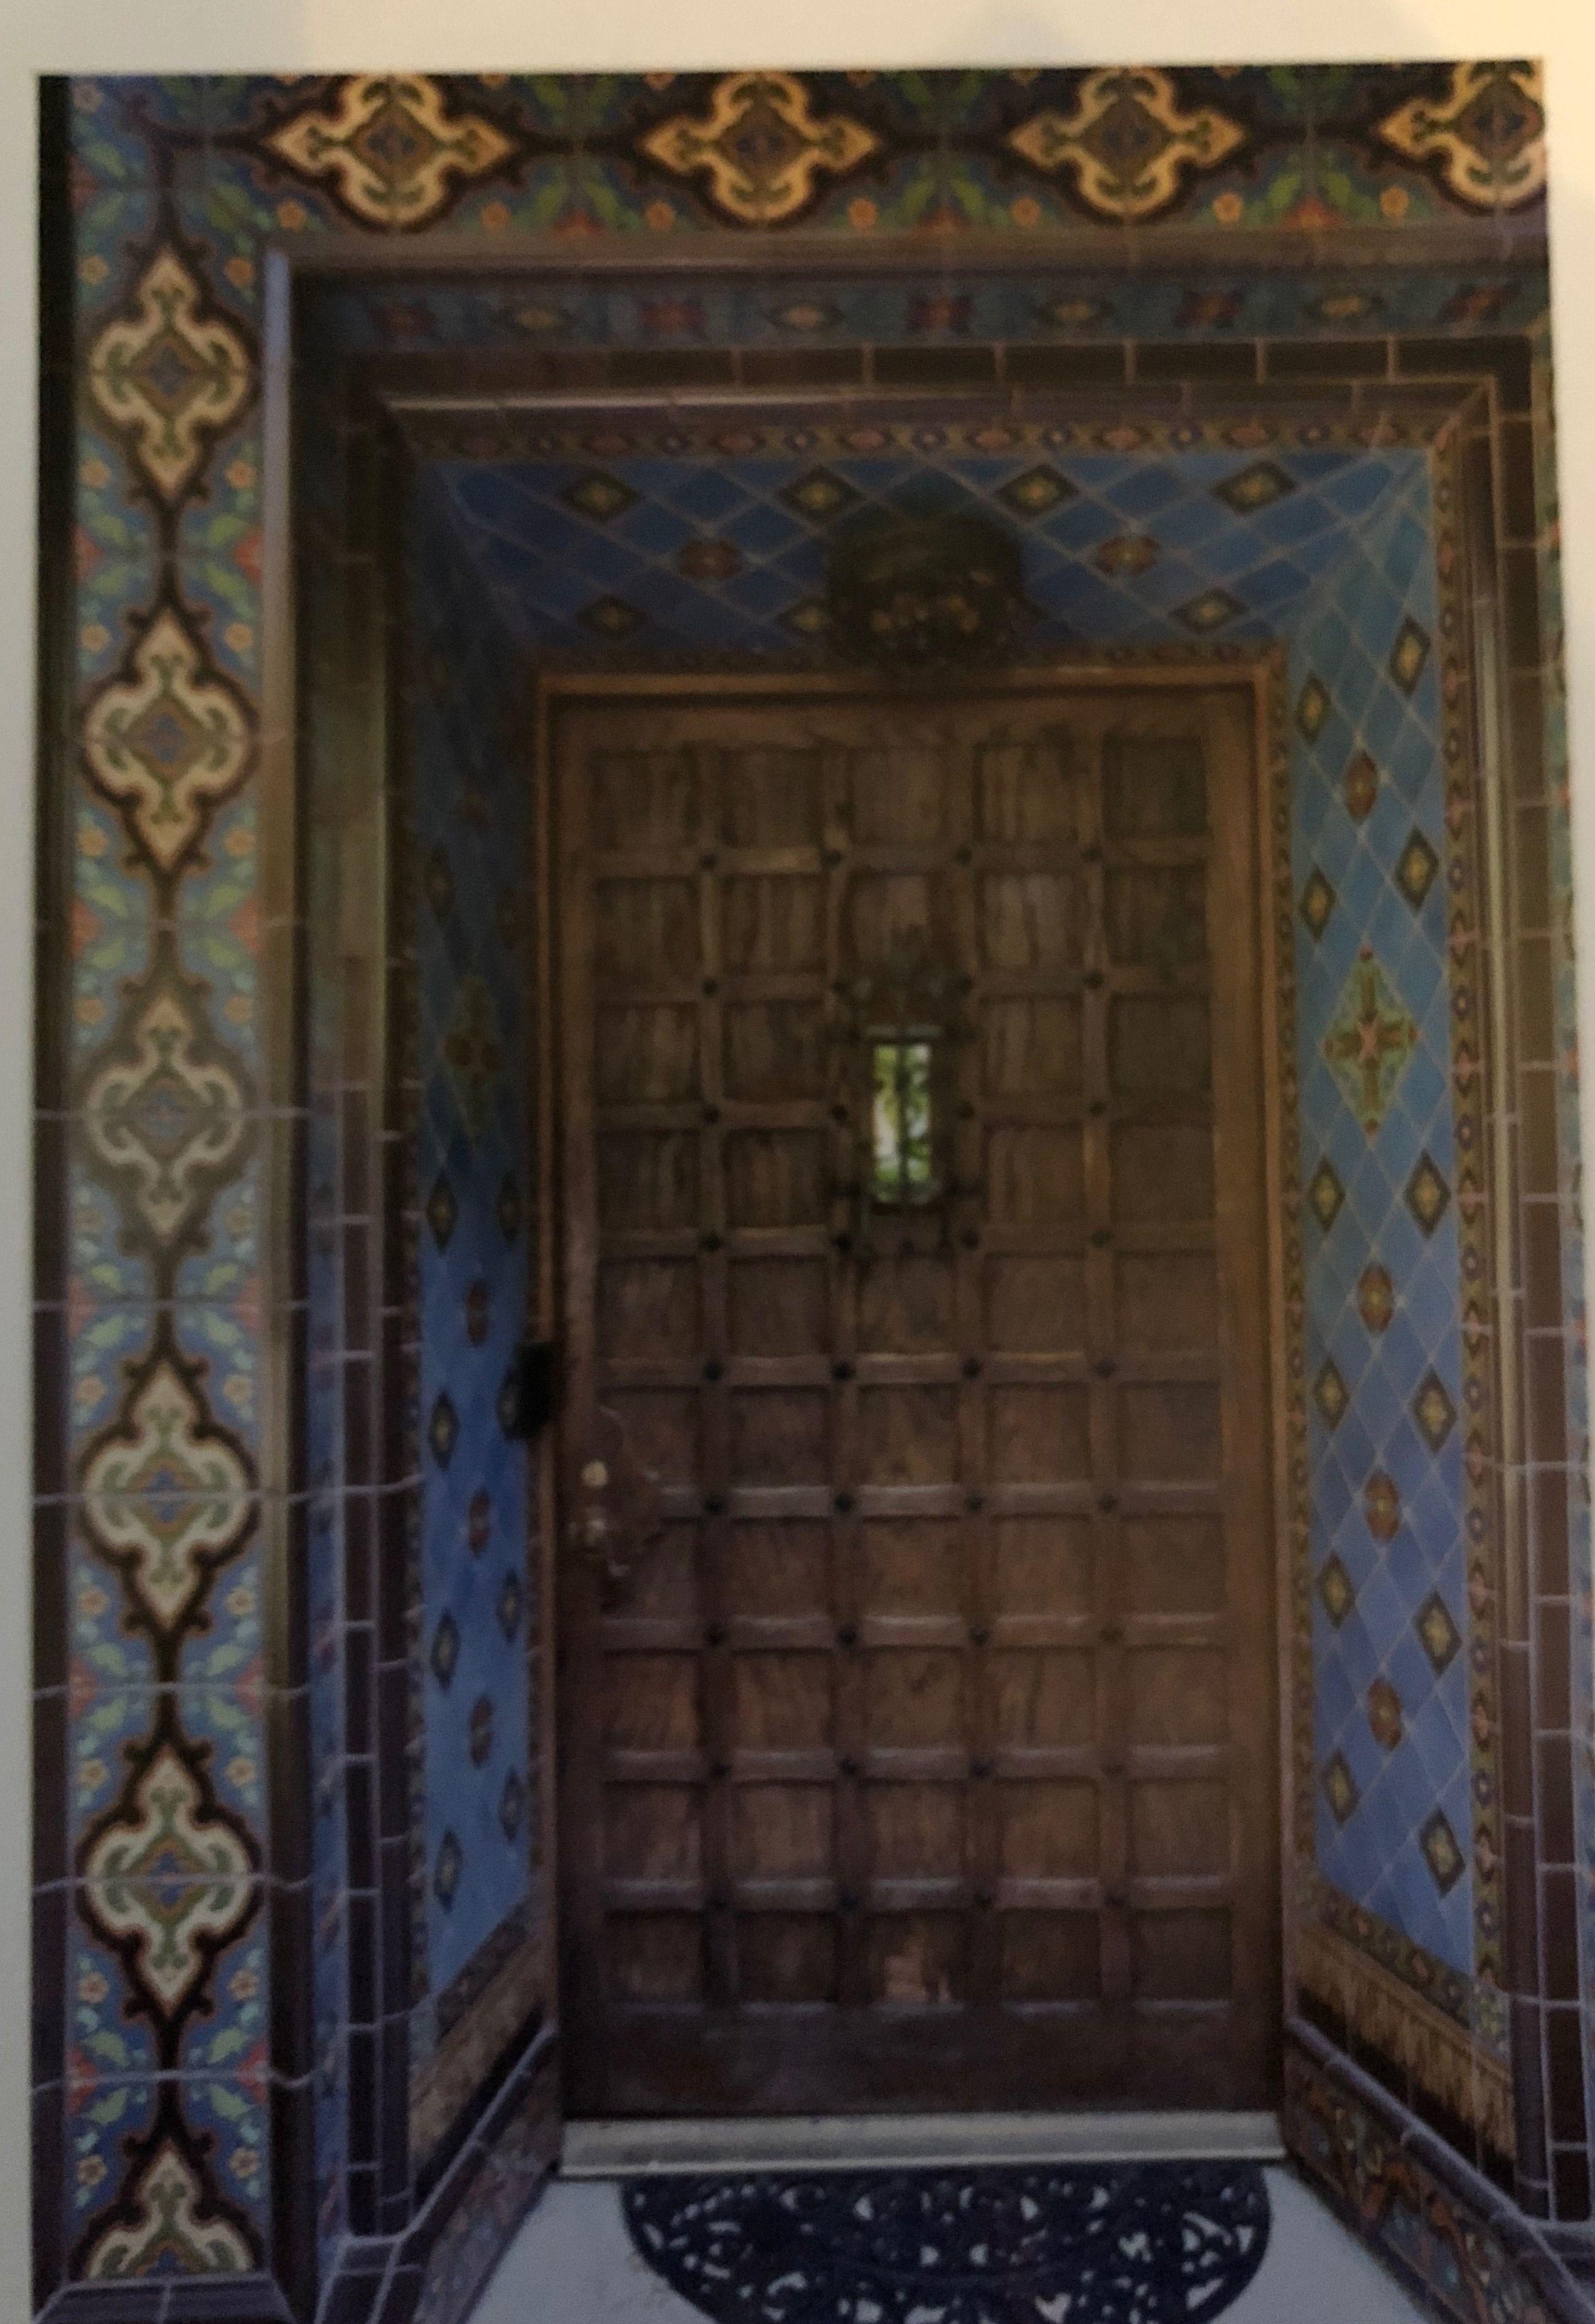 Pin by jeannette nunez on Entryways | Decor, Entryway